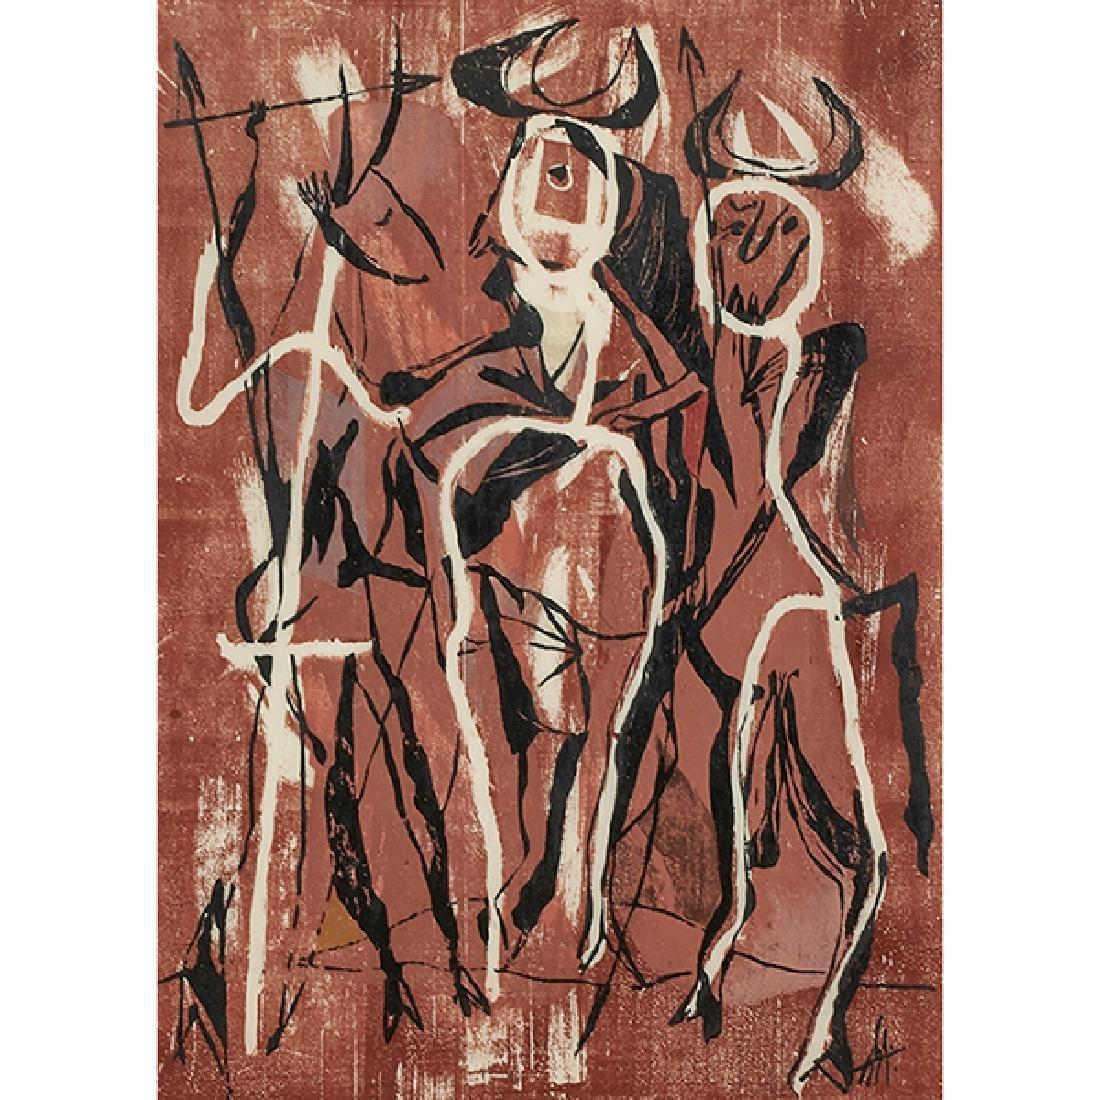 Adja Yunkers, (American/Latvian, 1900-1983), The